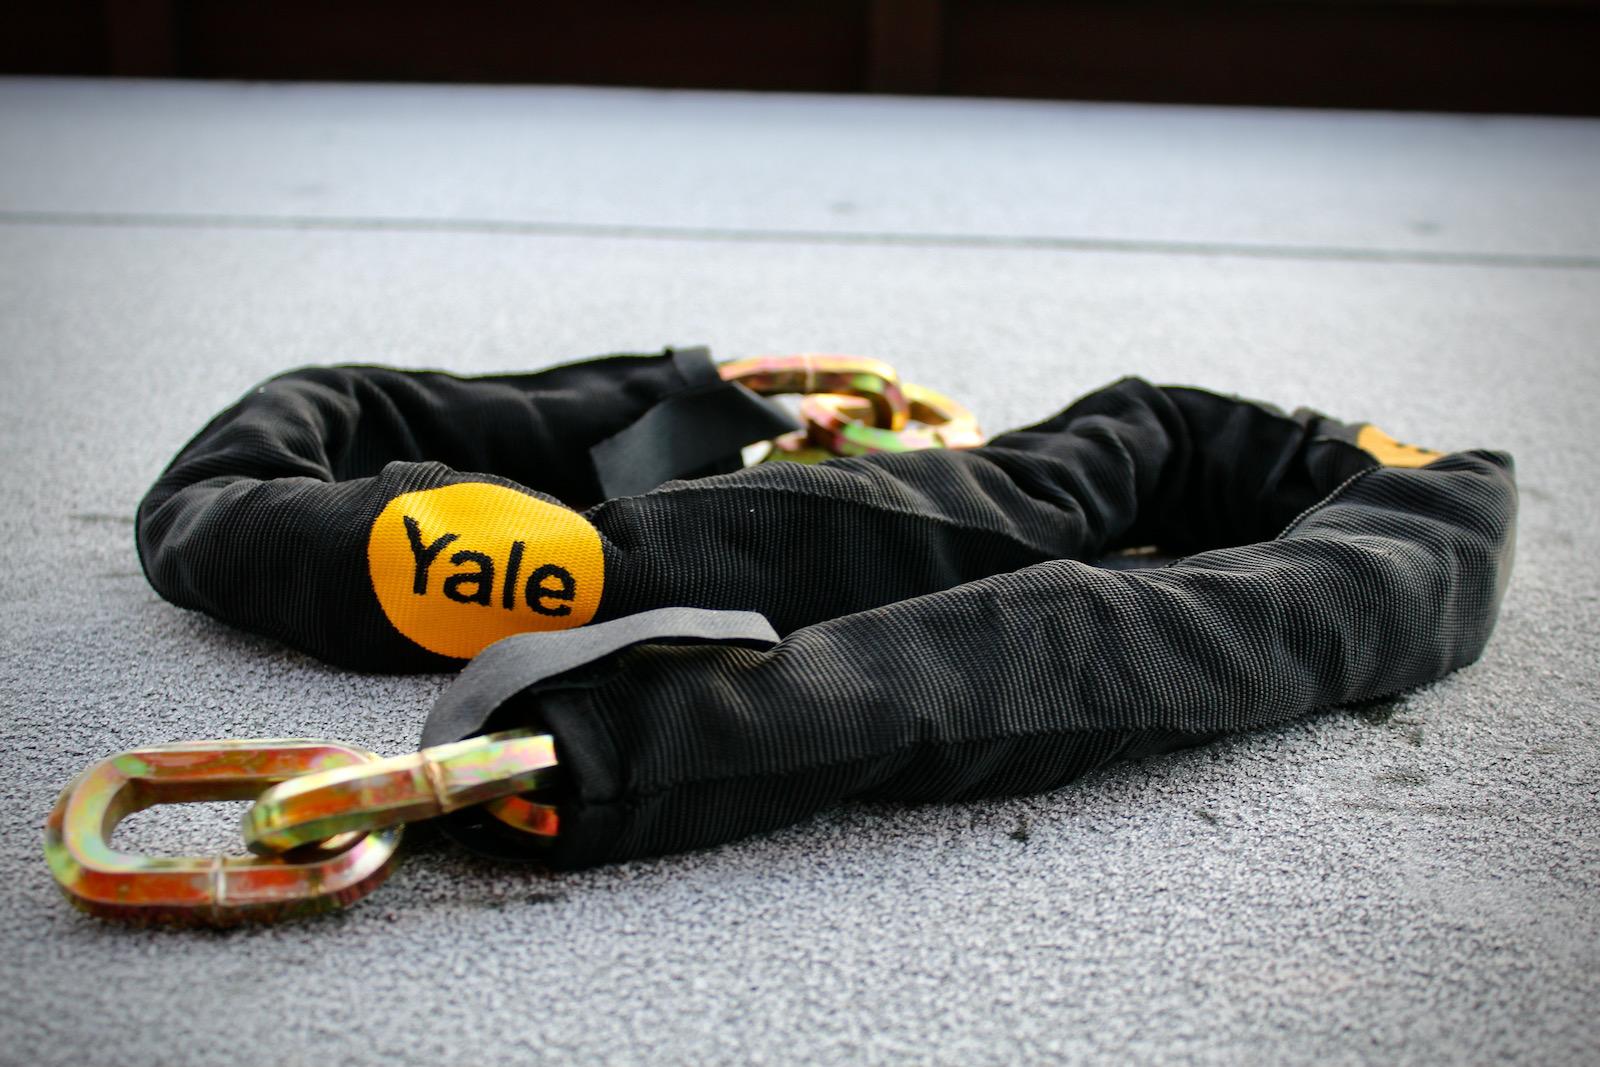 Yale Maximum Security Defendor Chain and Lock